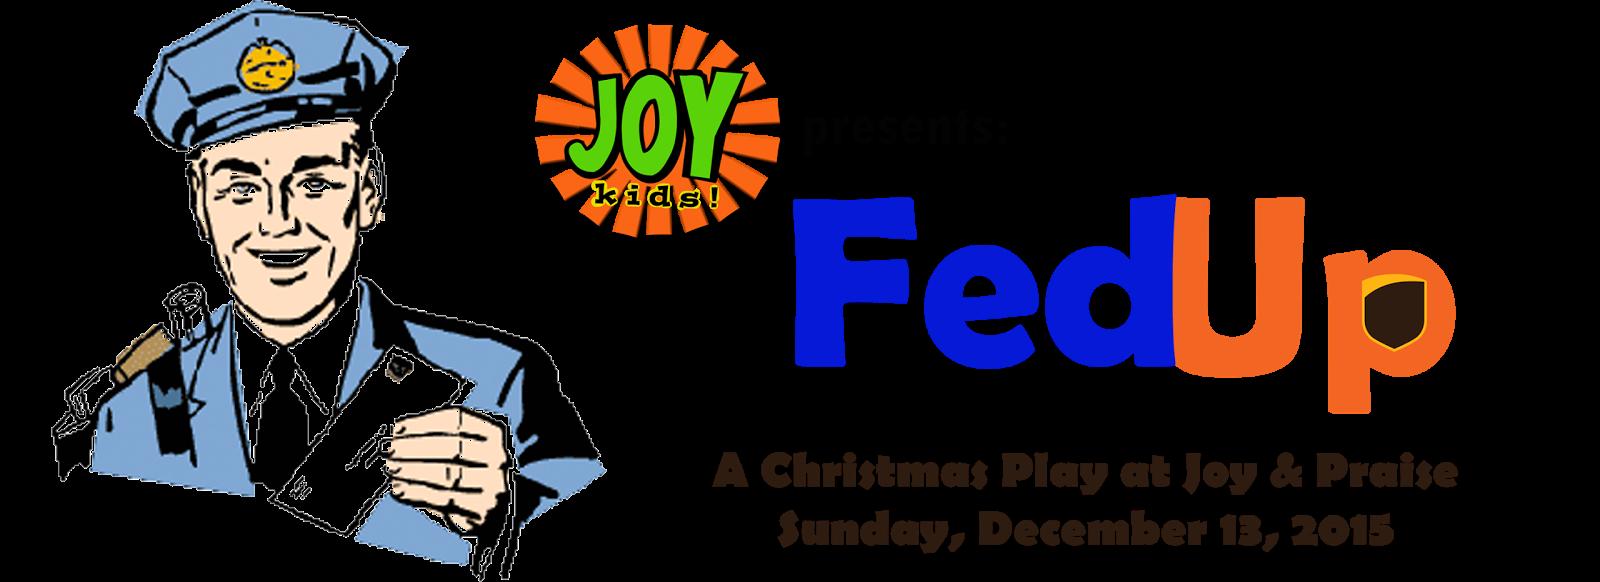 Joy and Praise Fellowship: JoyKids Christmas Play